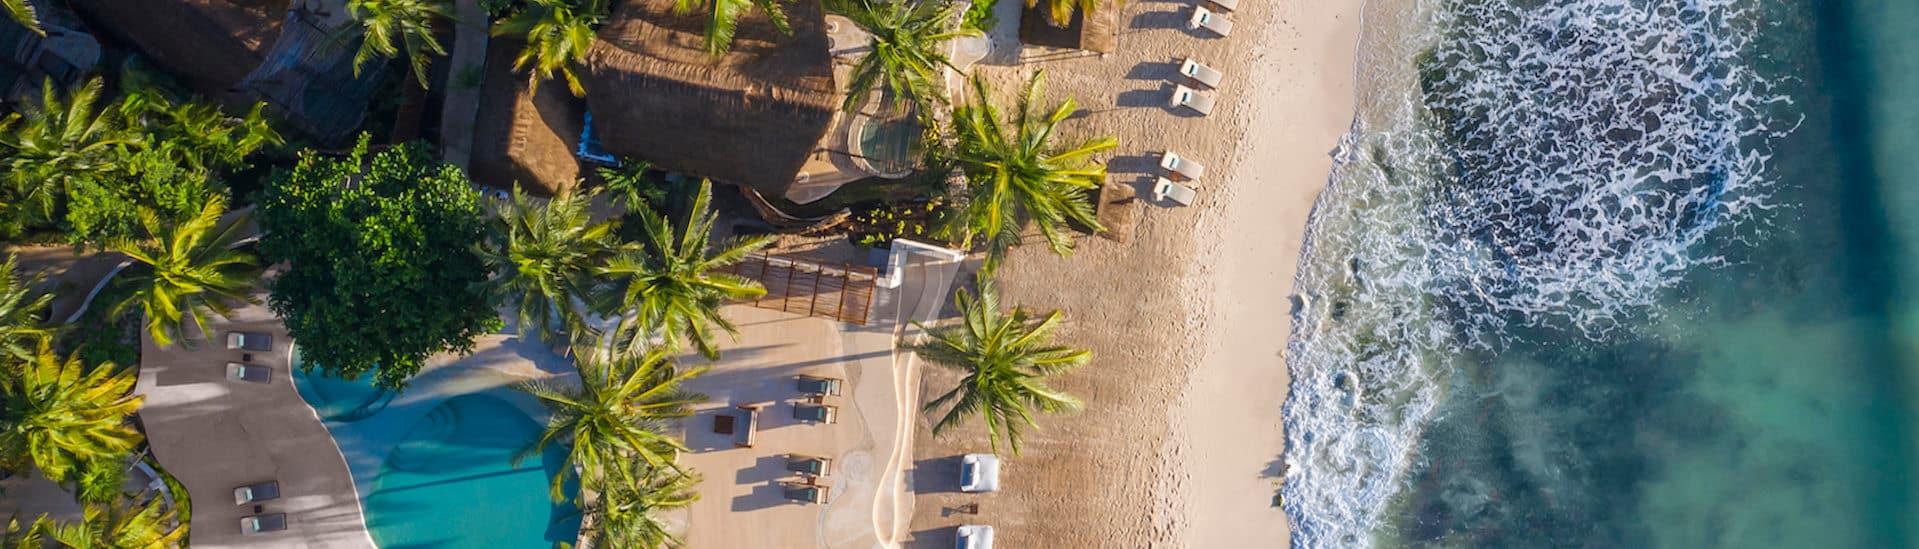 viceroy riviera maya resort beach